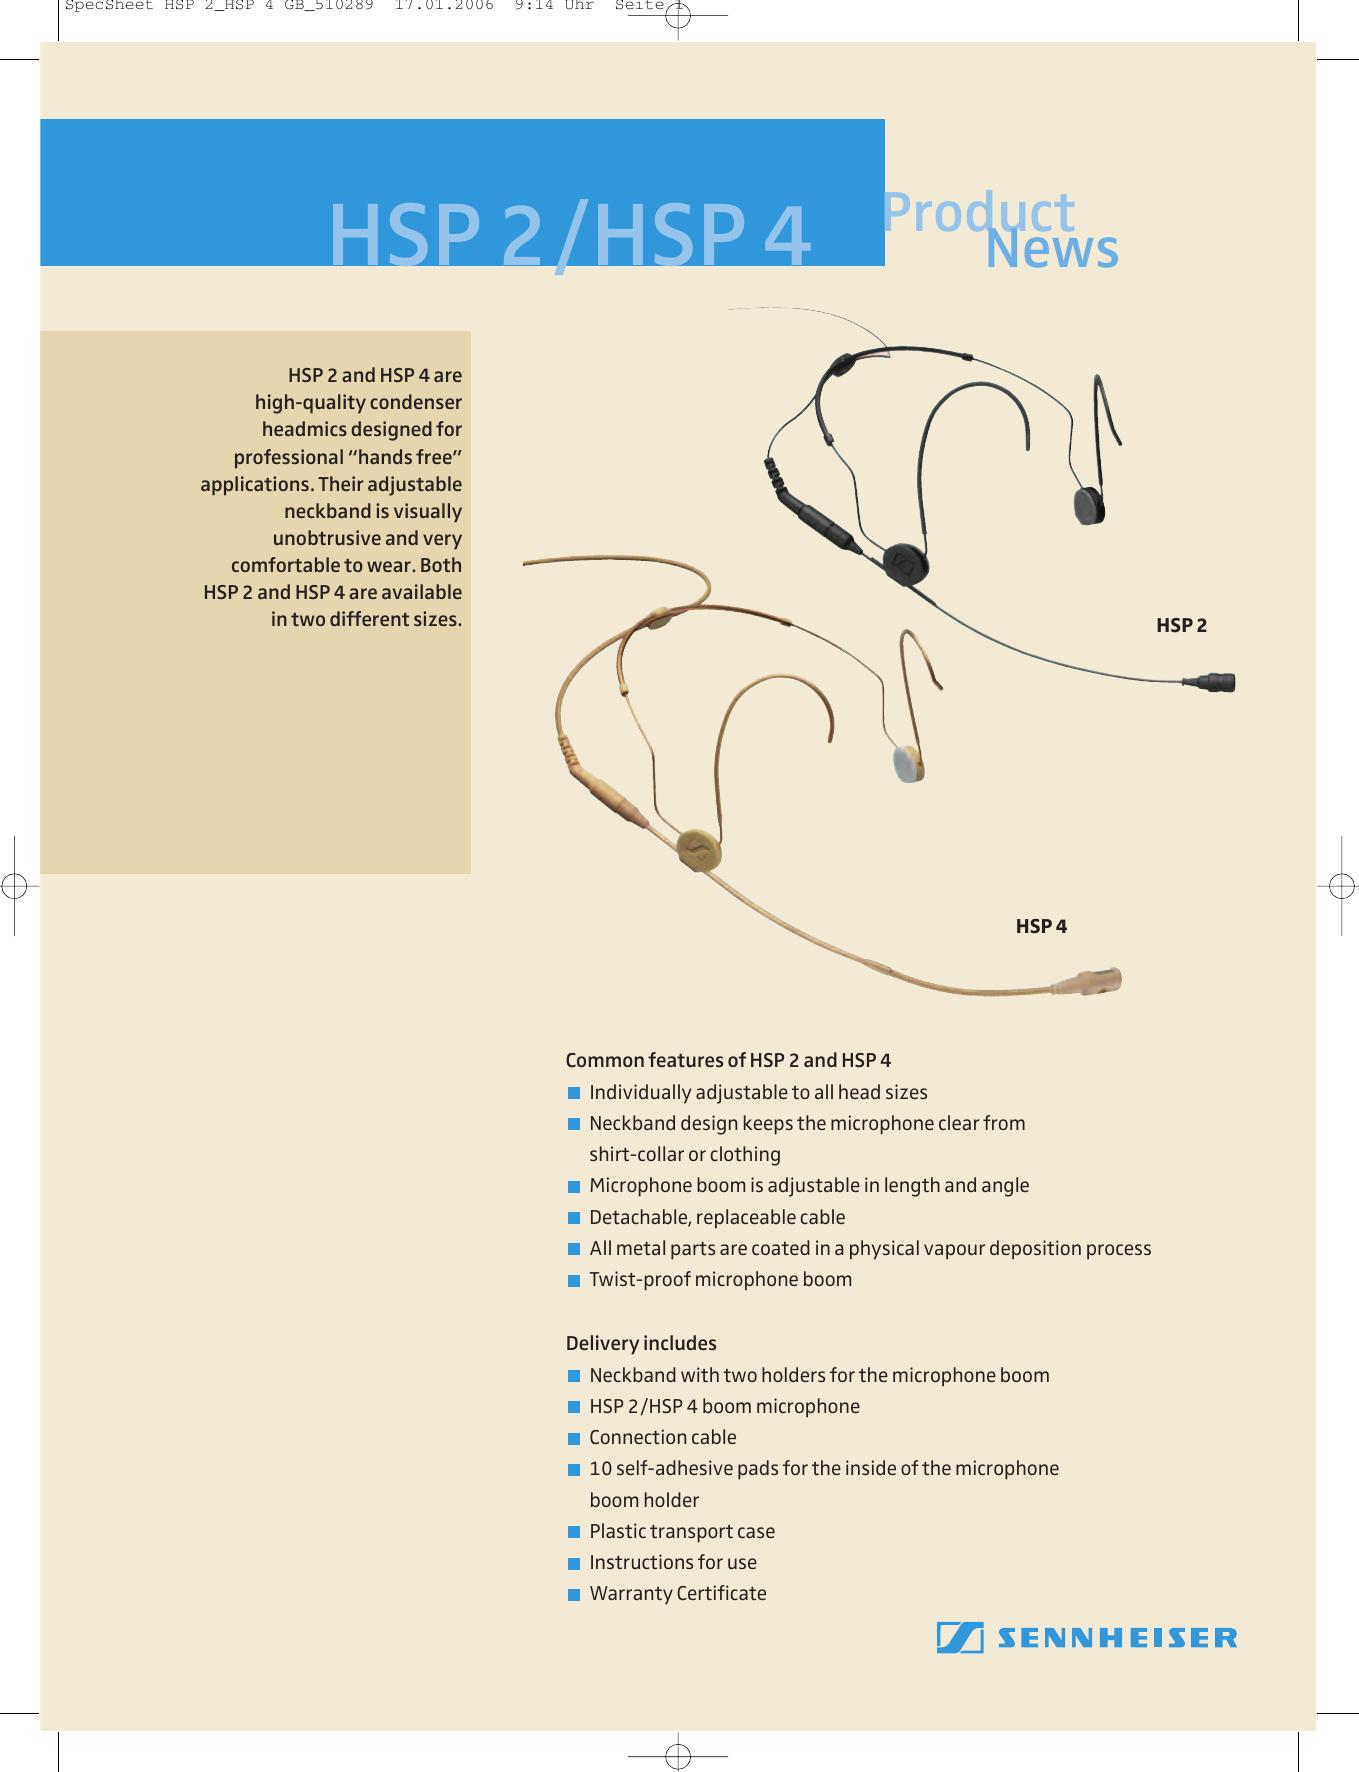 Sennheiser Hsp 2 M Users Manual Specsheet 4 Gb 510289 Microphone Wiring Diagram